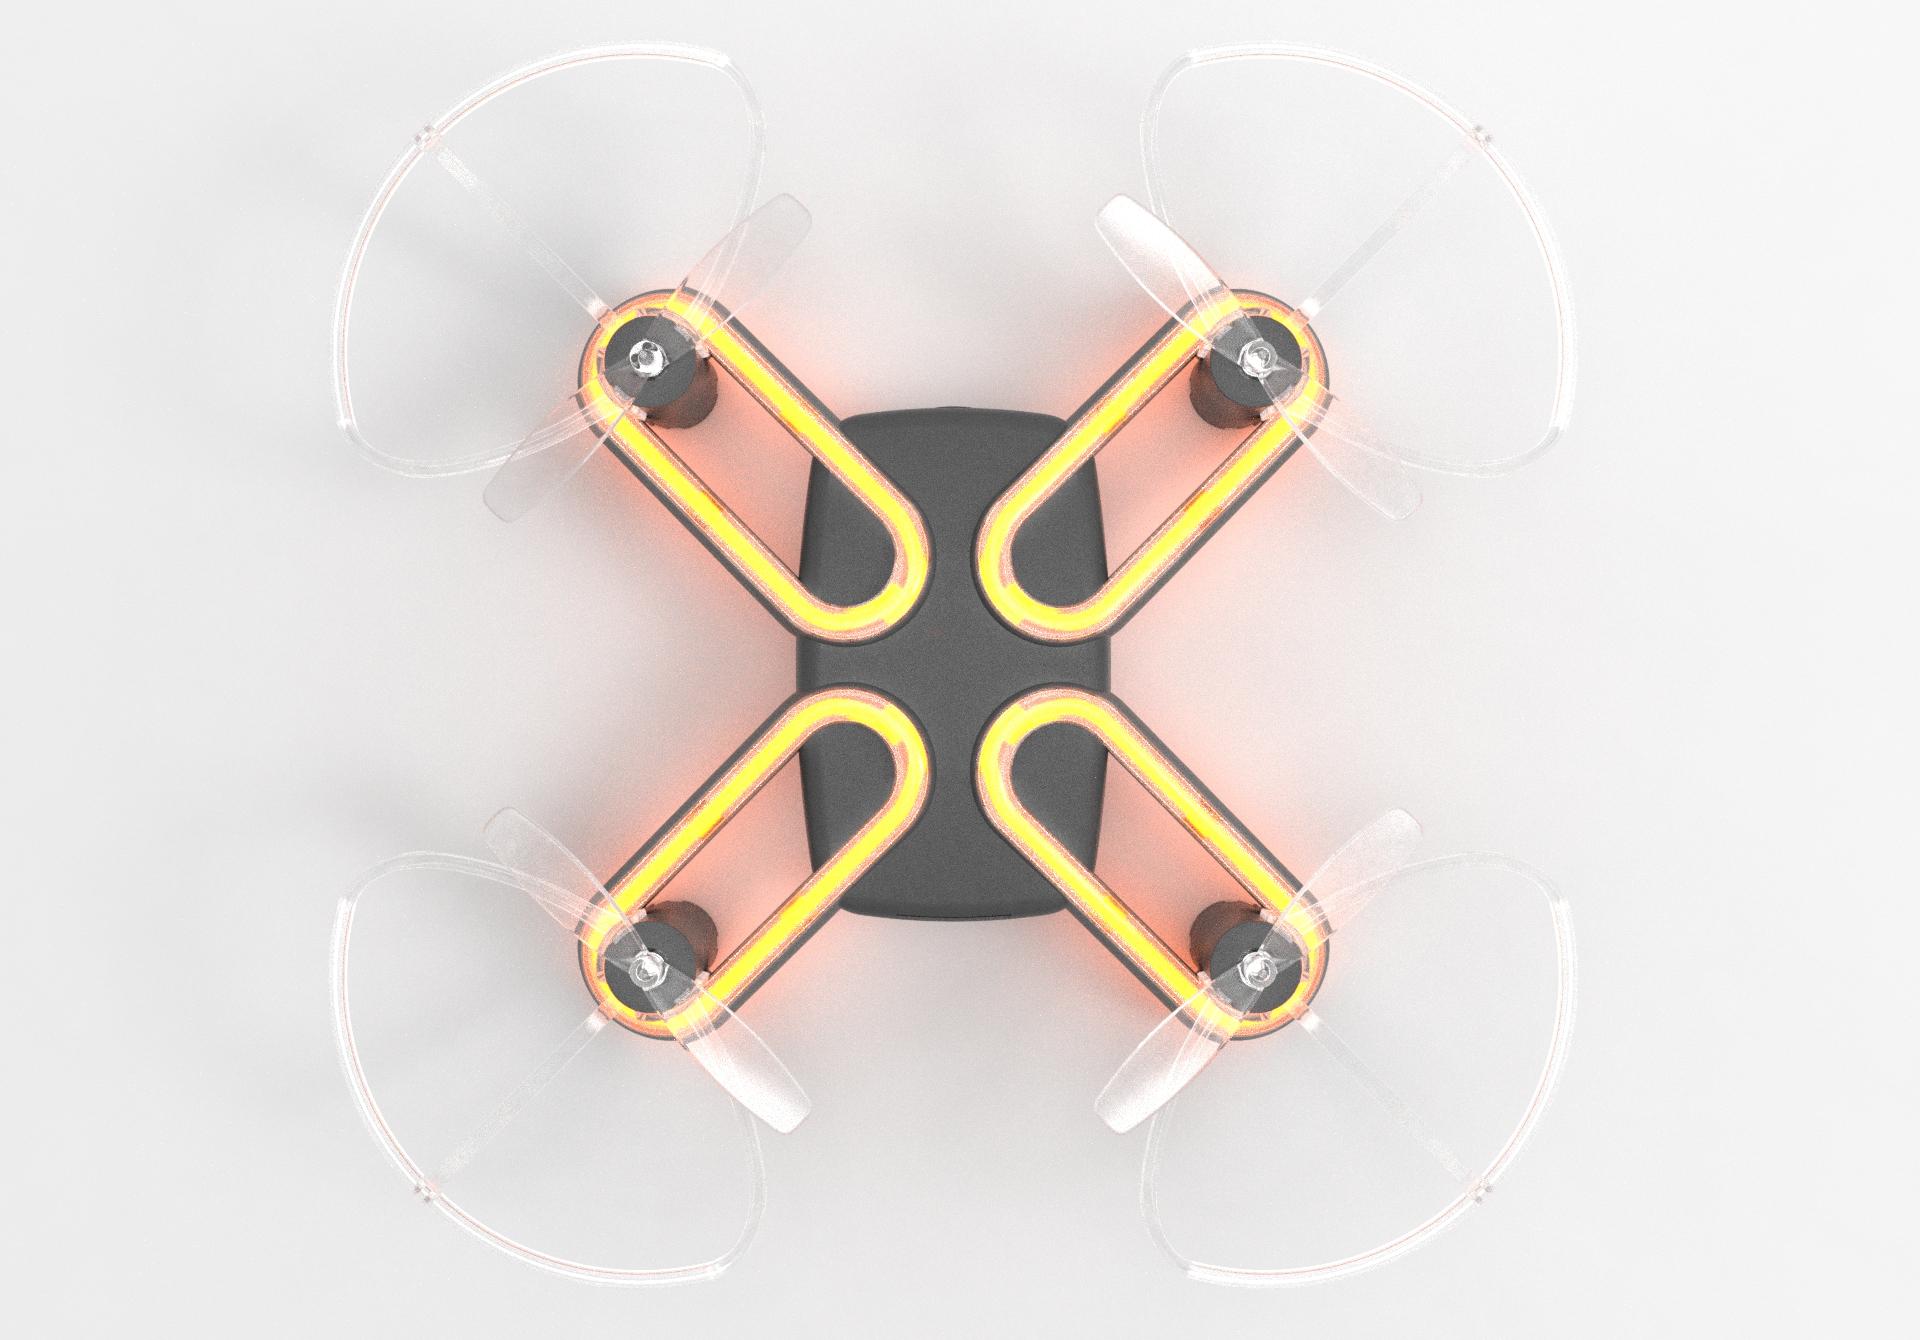 Propel_Ultron_Palm-sized_Camera_Drone_27-09-2017.77.jpg